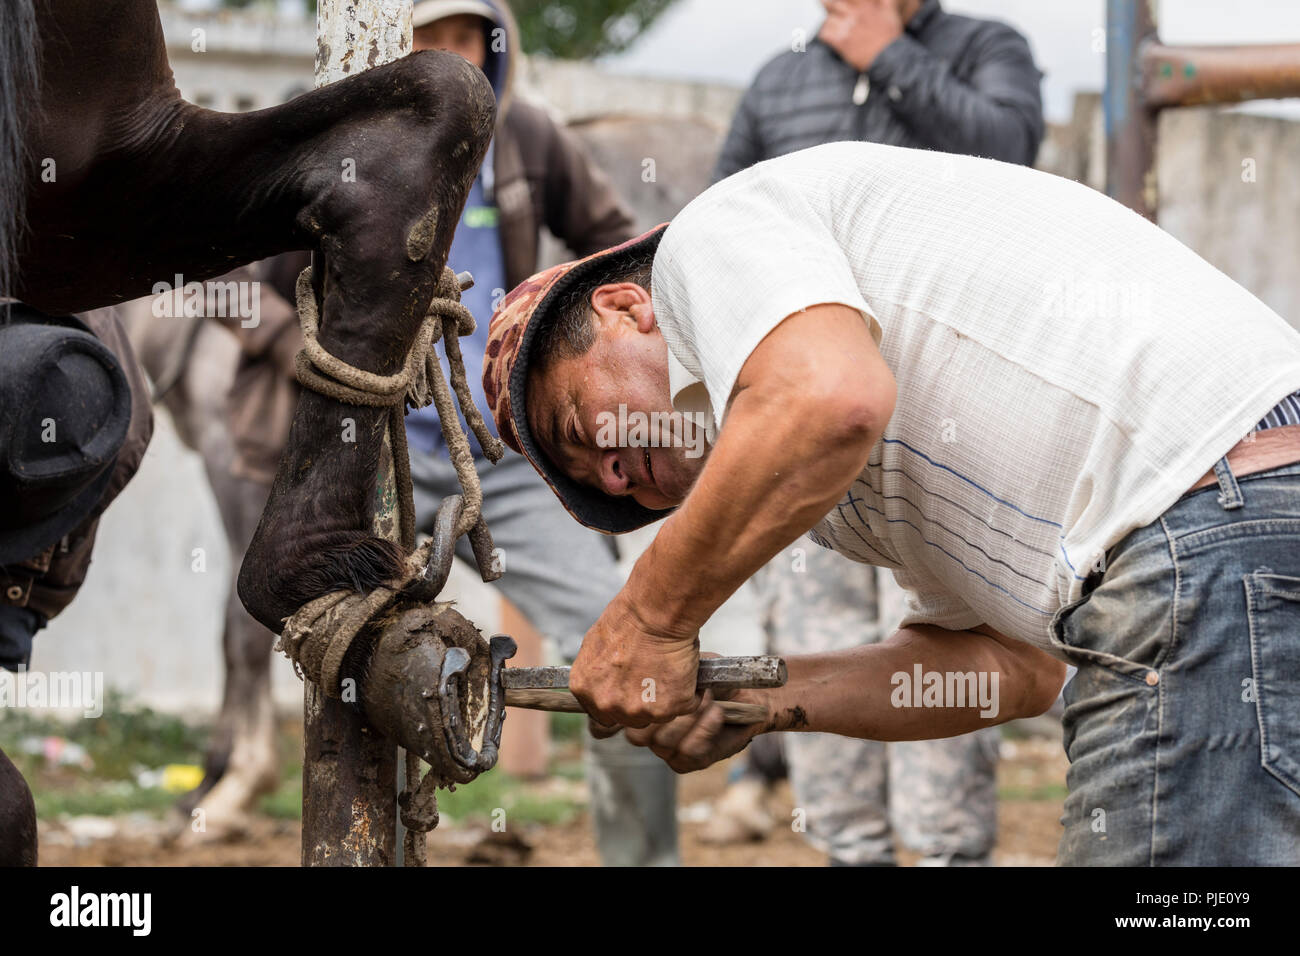 Karakol, Kyrgystan, August 13 2018: Farrier on the weekly animal market in Karakol changes horses' horseshoes - Stock Image